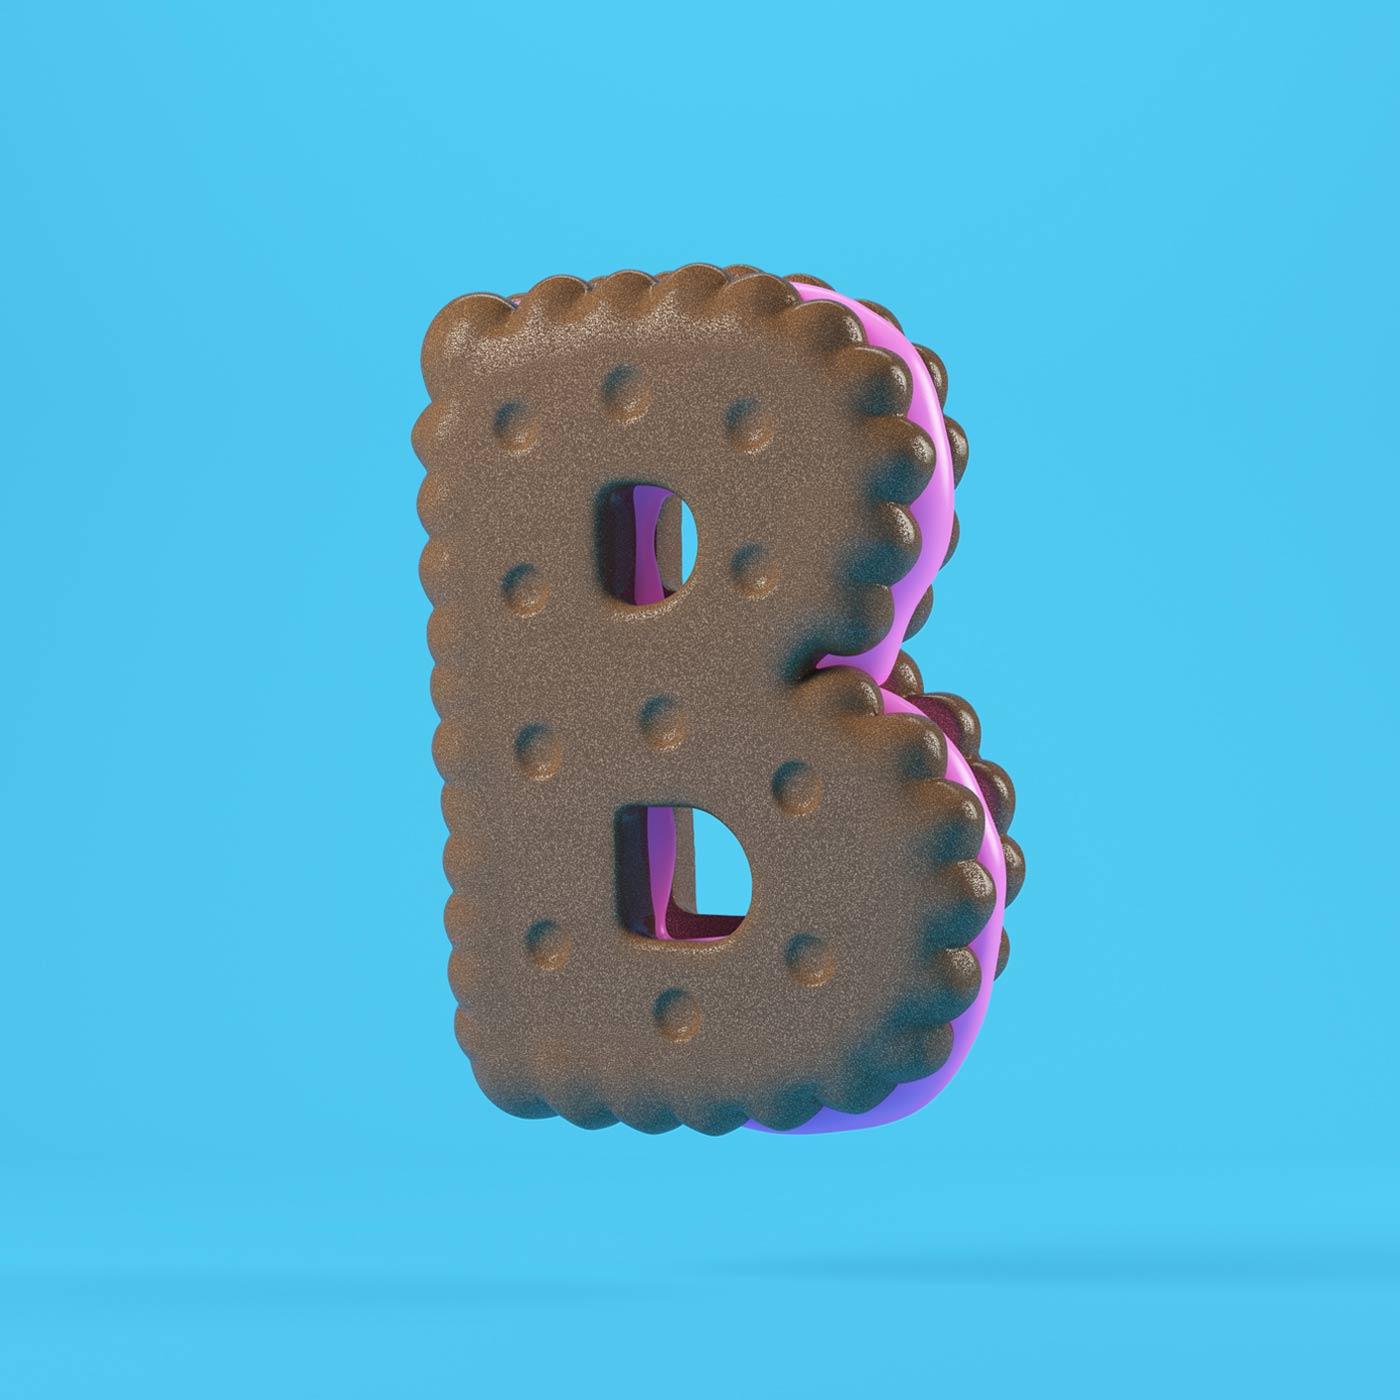 FOOD 3DFOOD FOODALPHABET CESS 3D 3DTYPE LETTERING CGI 3DARTIST COOKIE